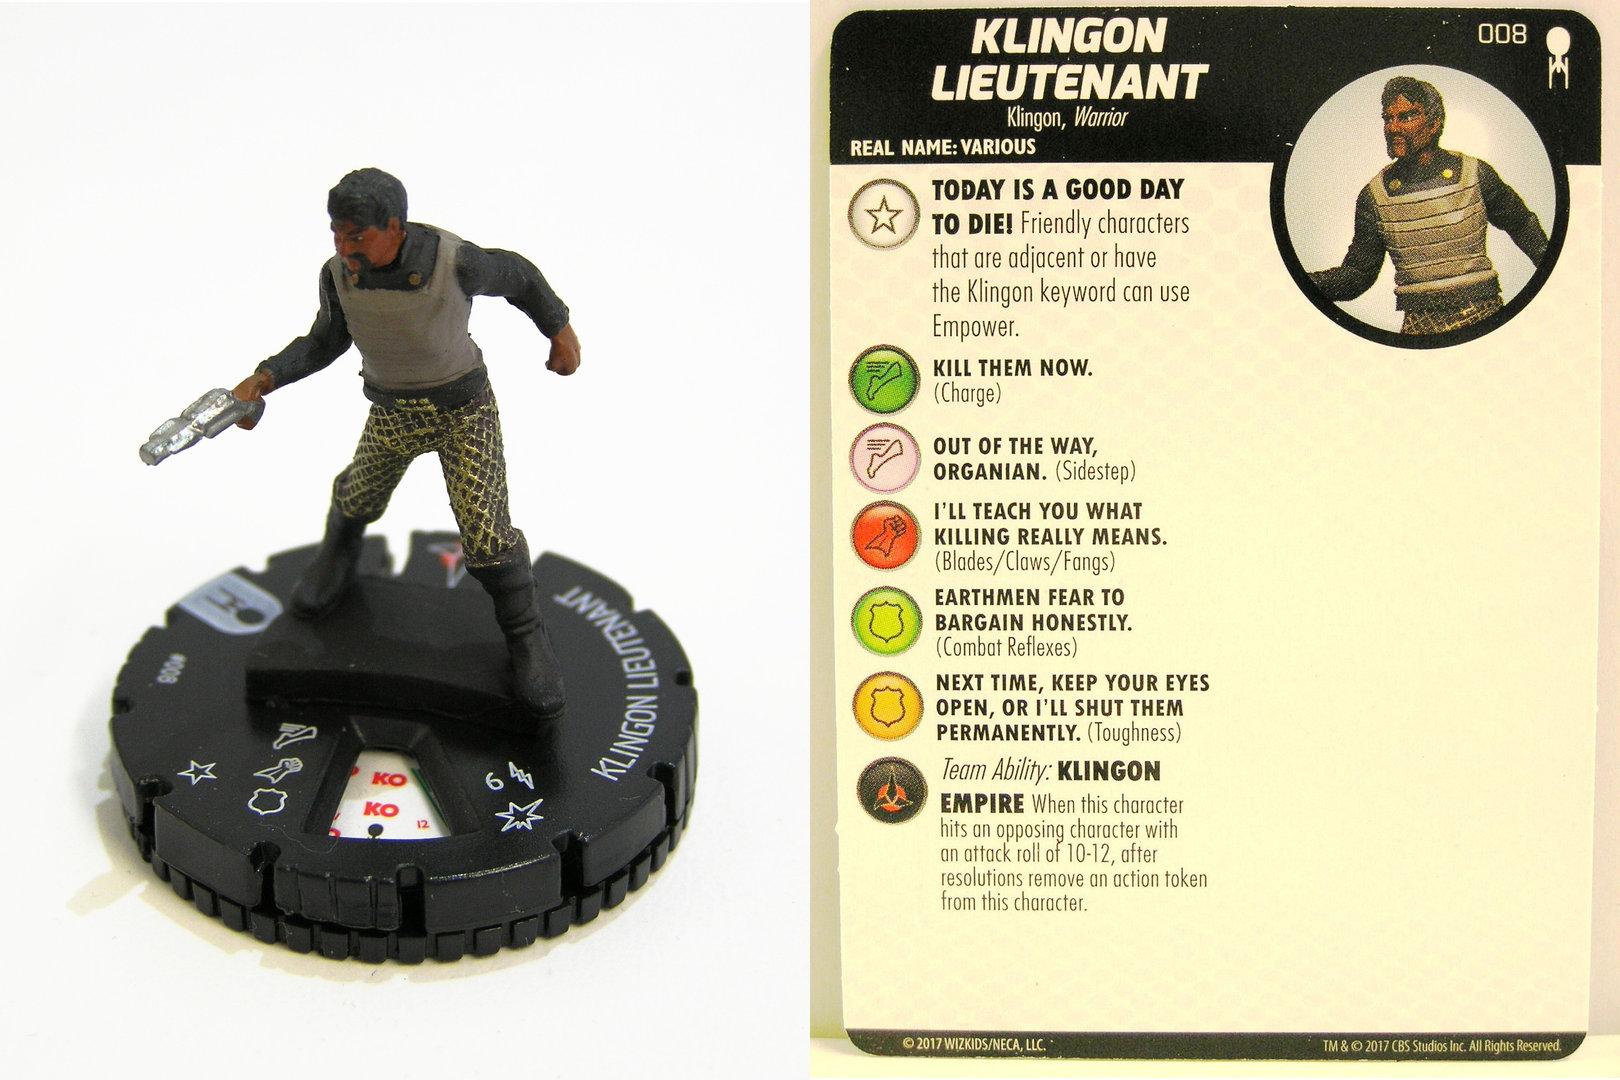 #002 Klingon Bekk Heroclix Star Trek Away Team The Original Series